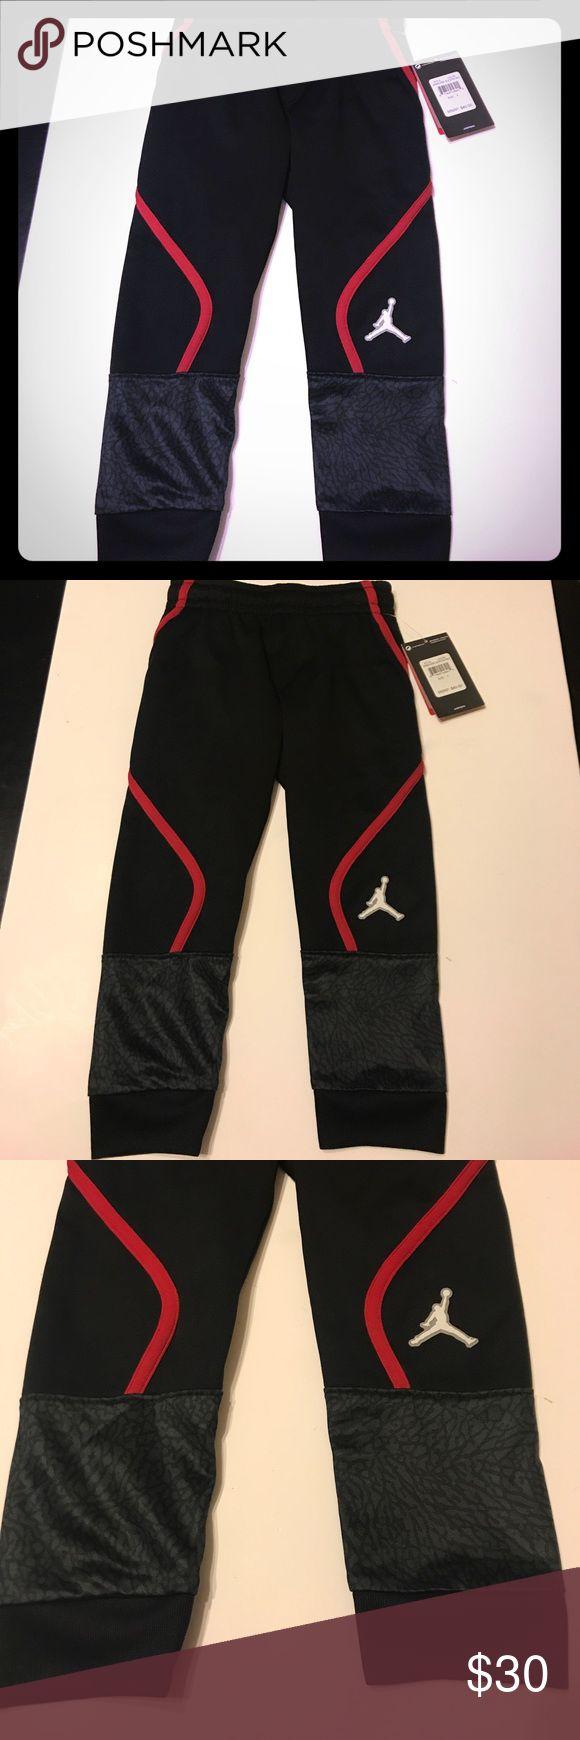 Kids Jordan Sweats New with tags, size 4, 100% polyester, side pockets Jordan Bottoms Sweatpants & Joggers